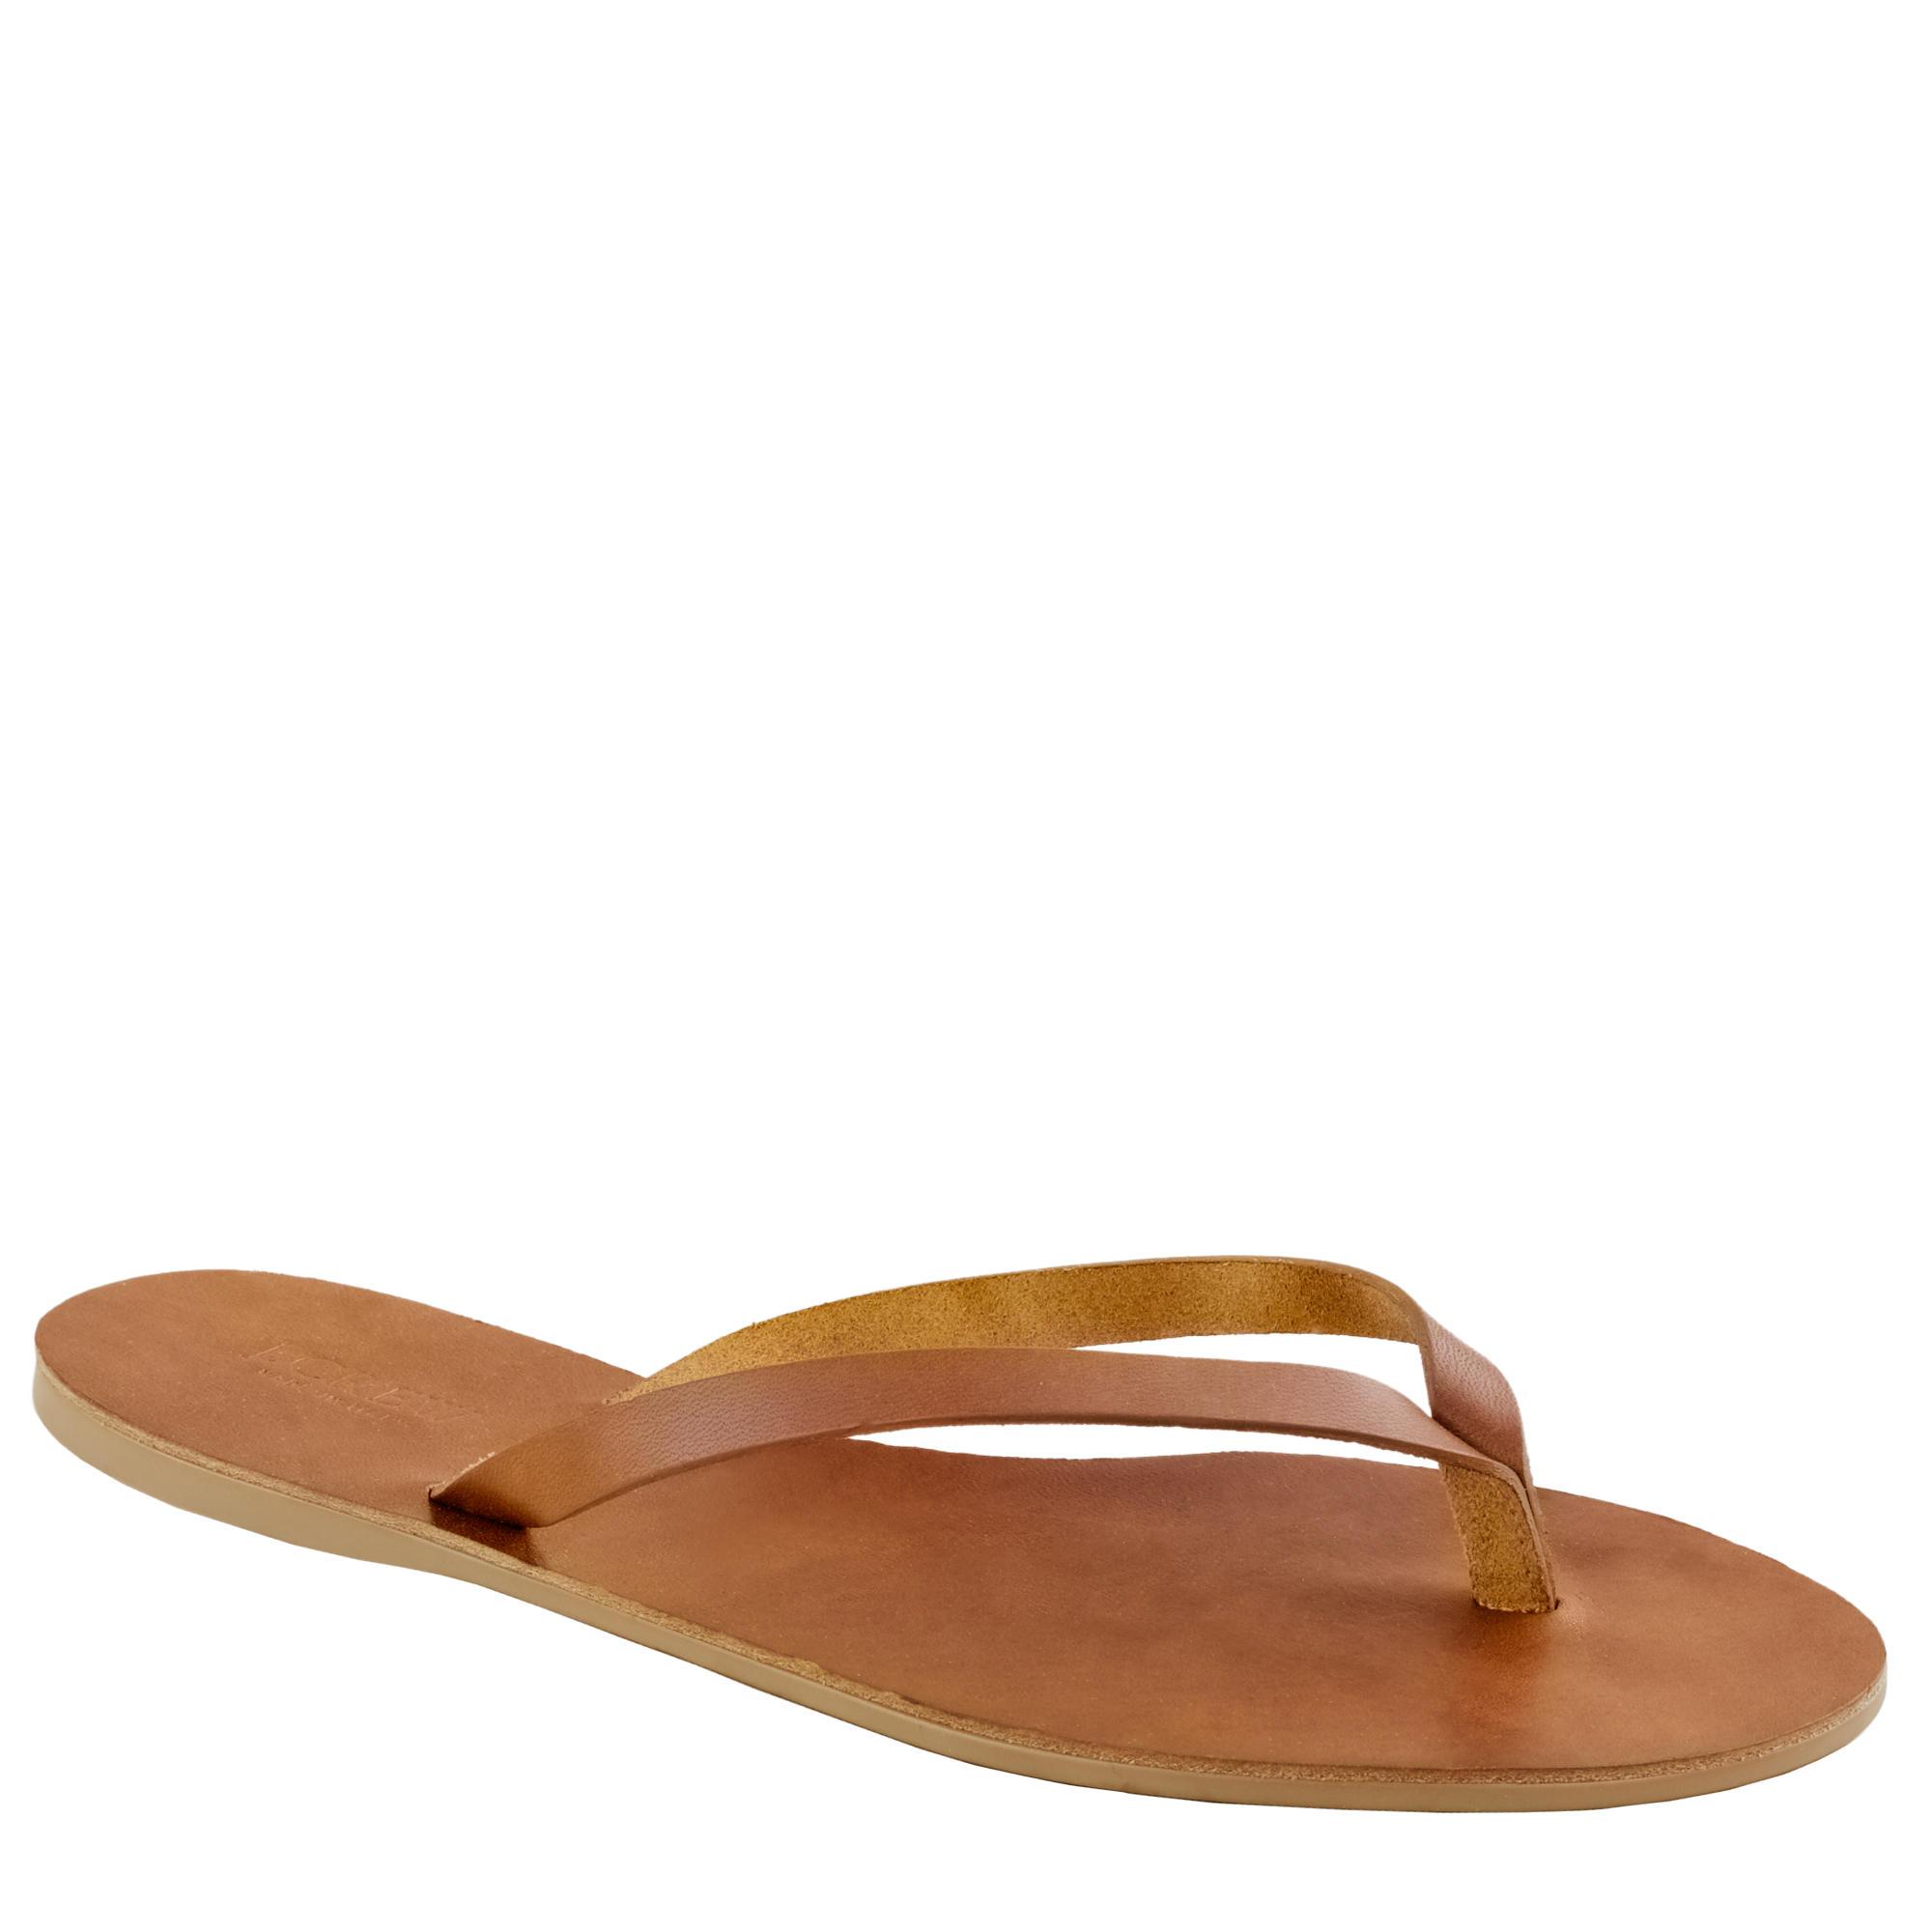 Vineyard leather flip-flops : | J.Crew